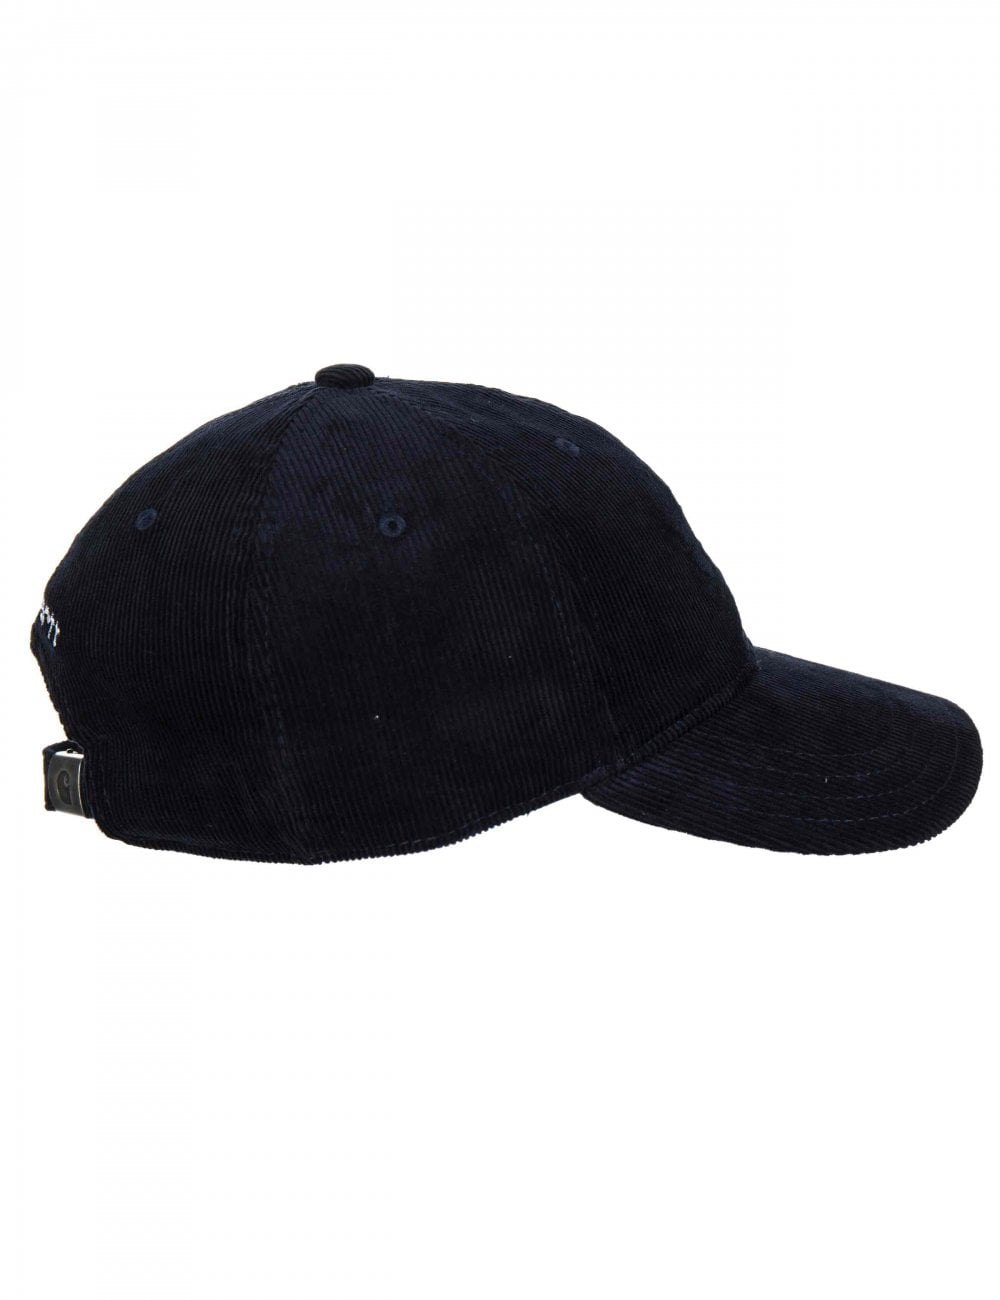 4afeb028b53 Carhartt WIP Manchester Cord Hat - Dark Navy - Hat Shop from Fat ...